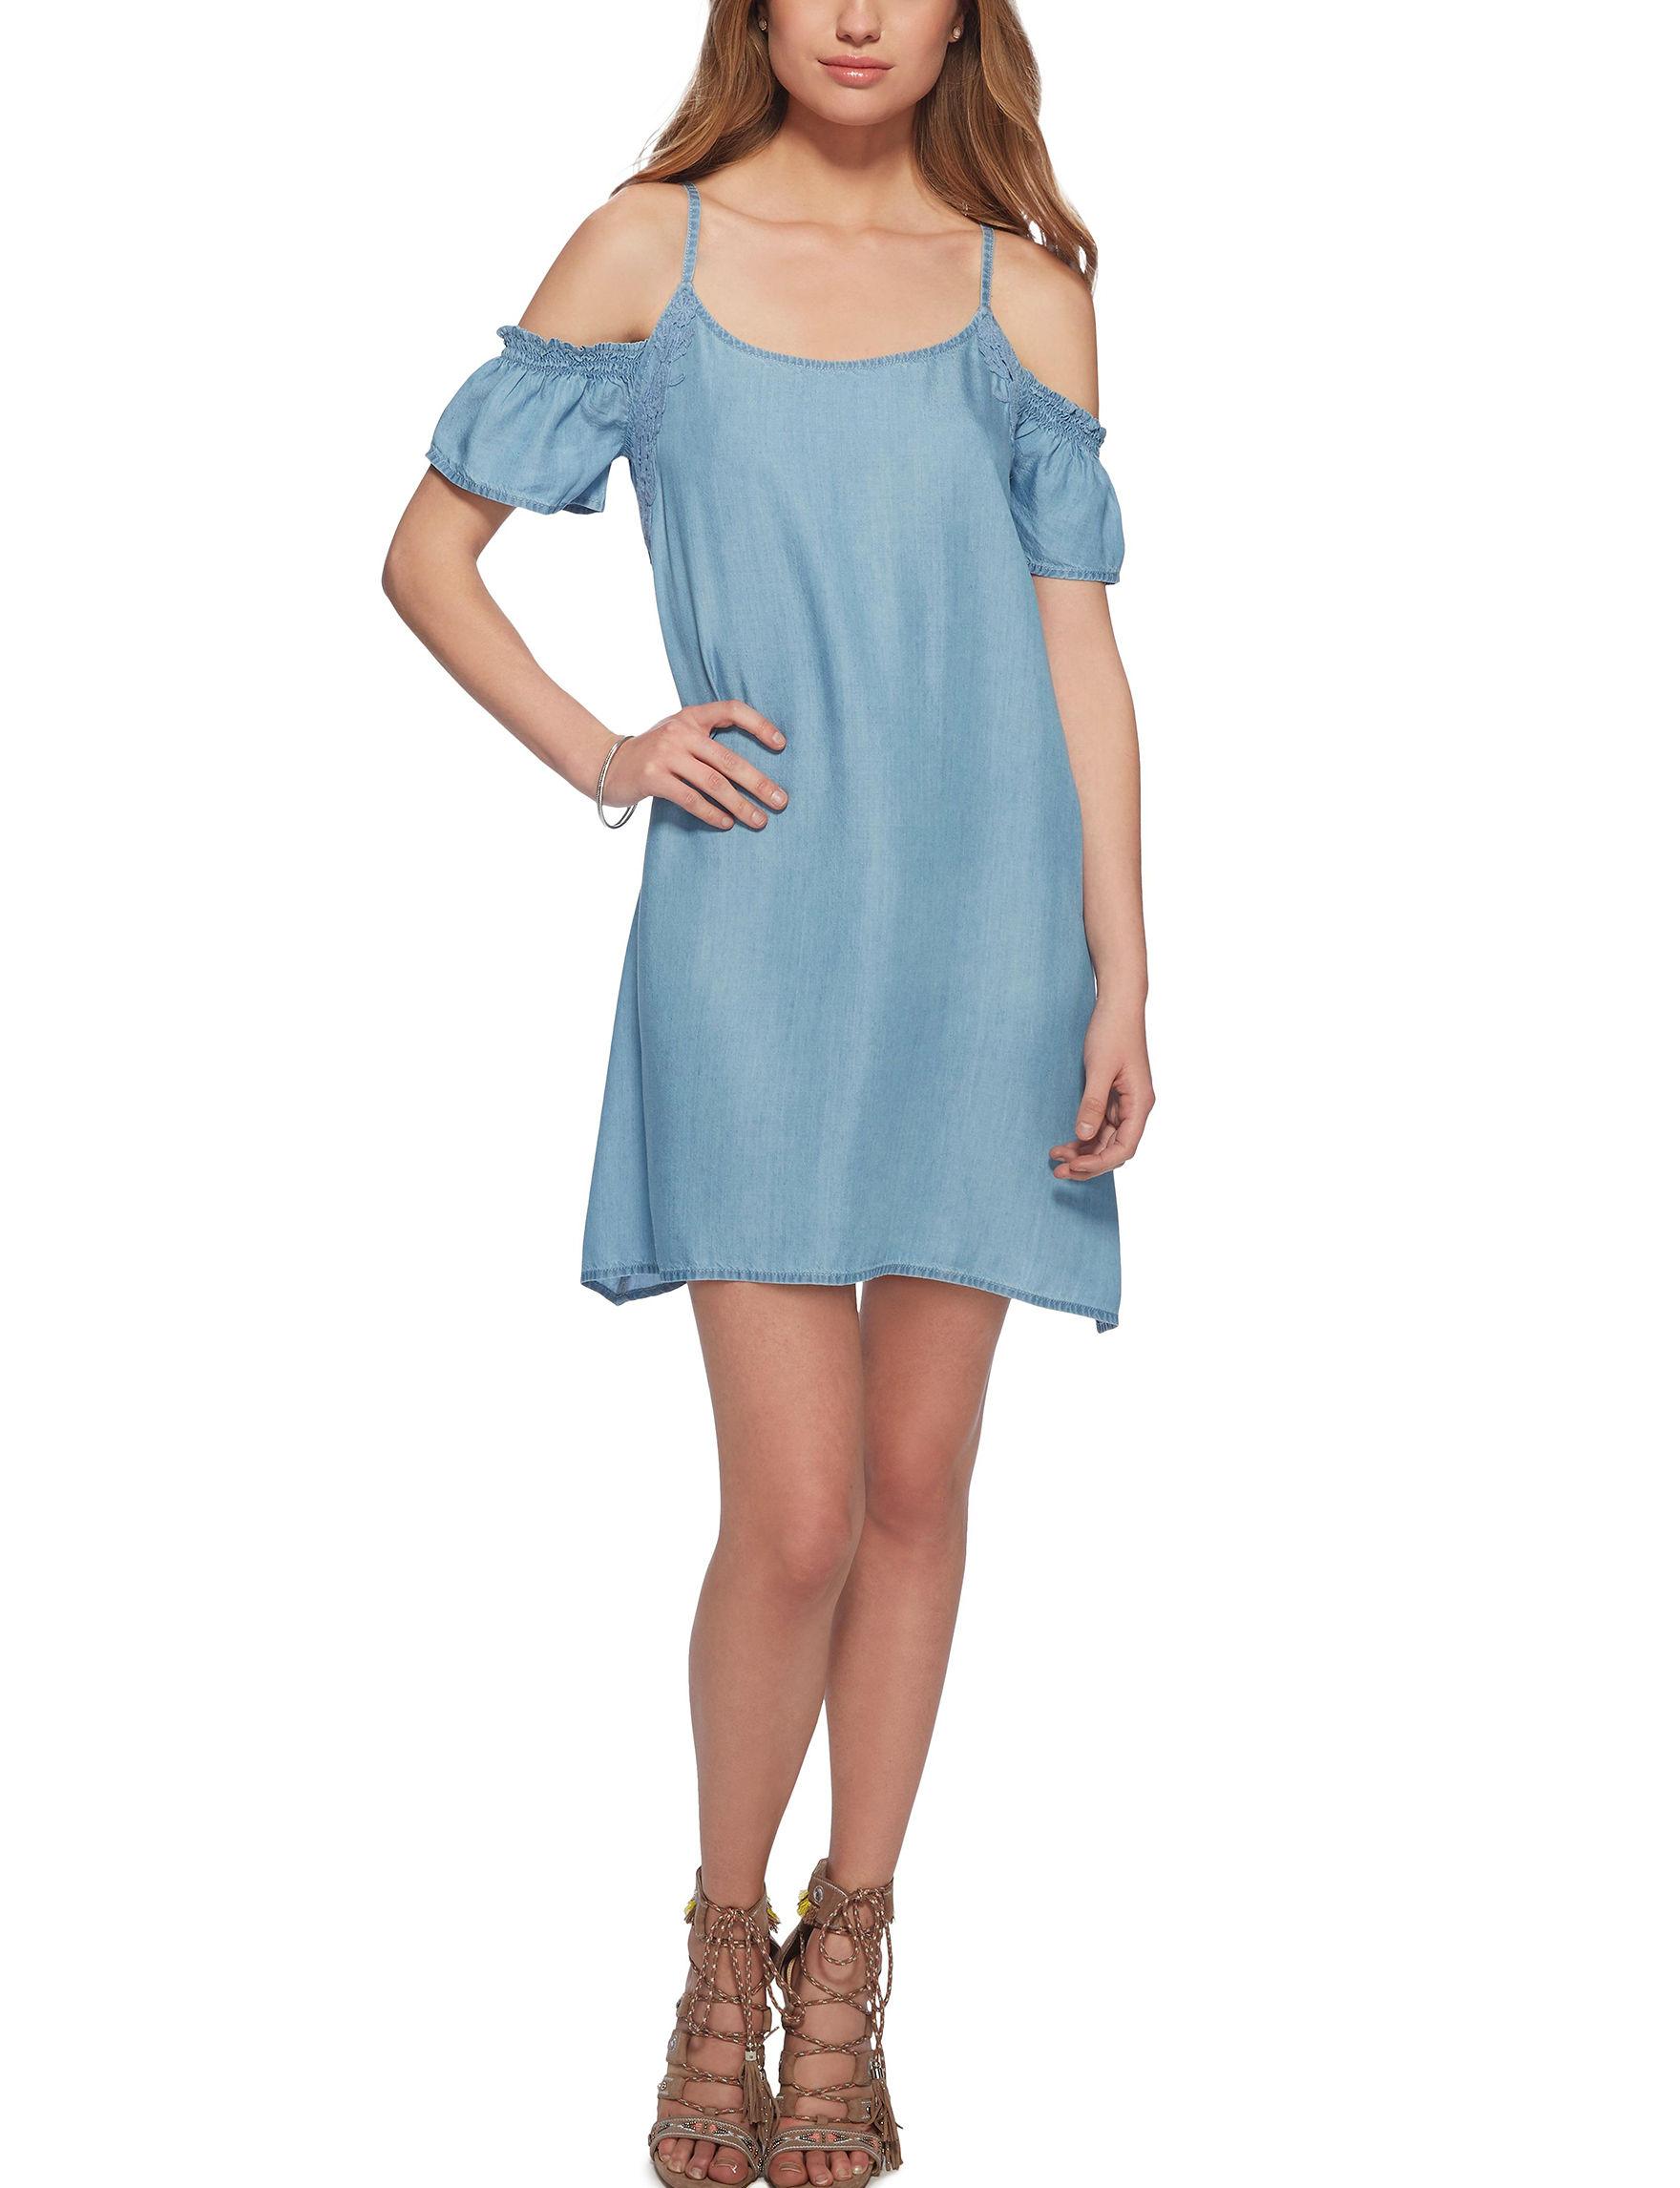 Jessica Simpson Blue